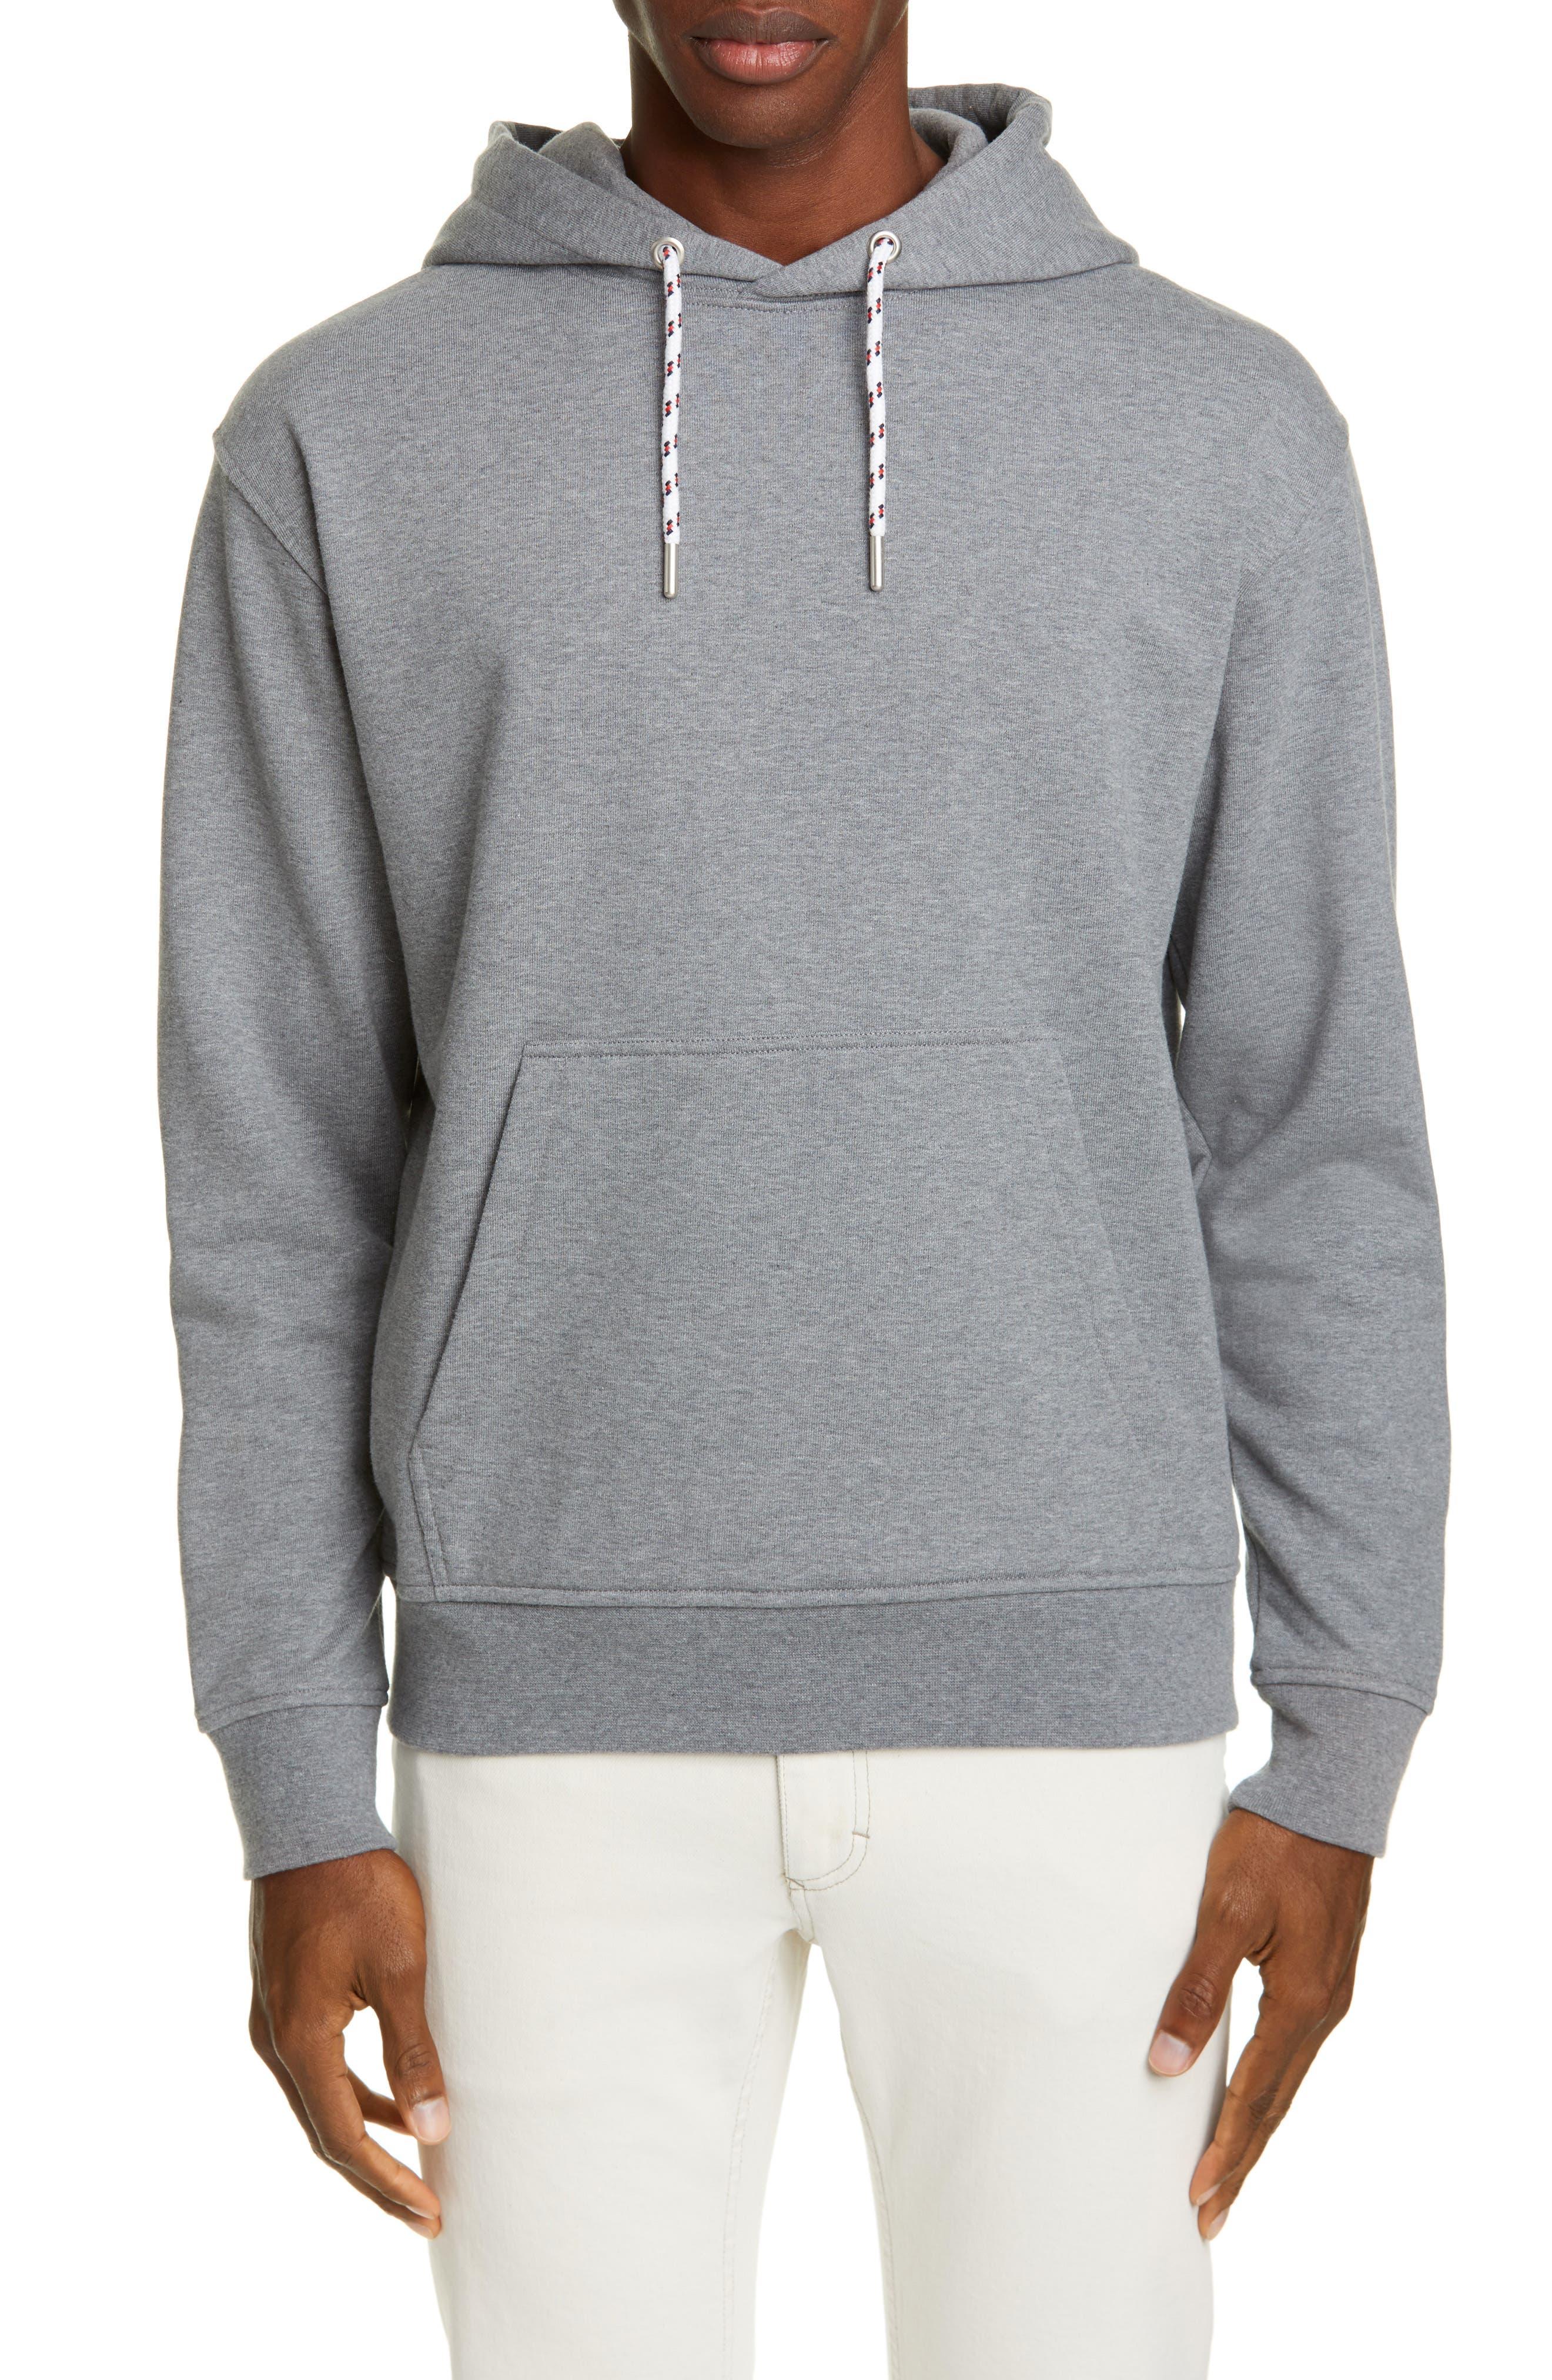 Image of CLOSED Hooded Sweatshirt